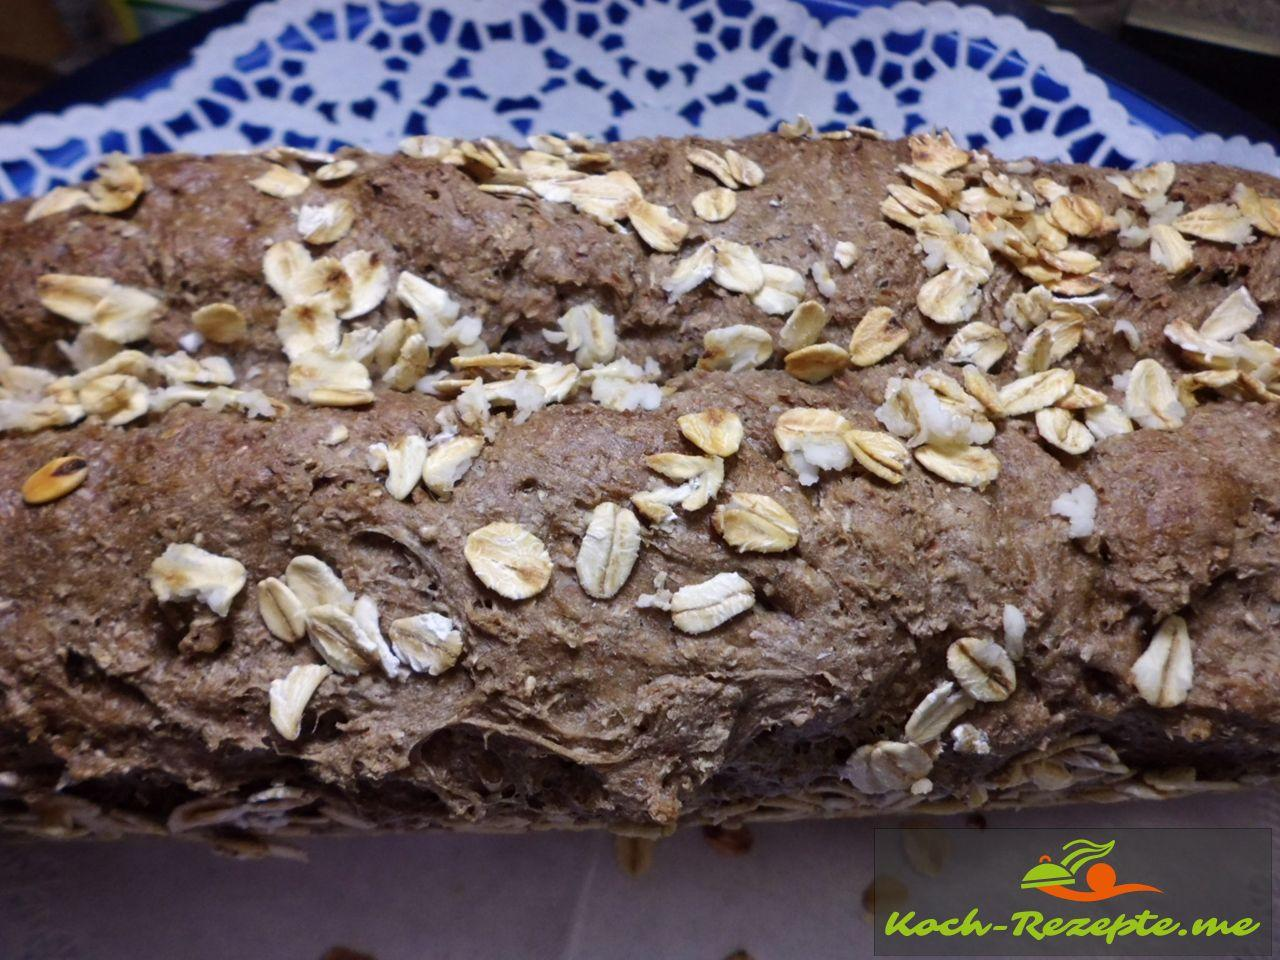 fertiges Vollkorn-Dinkelmehl Brot